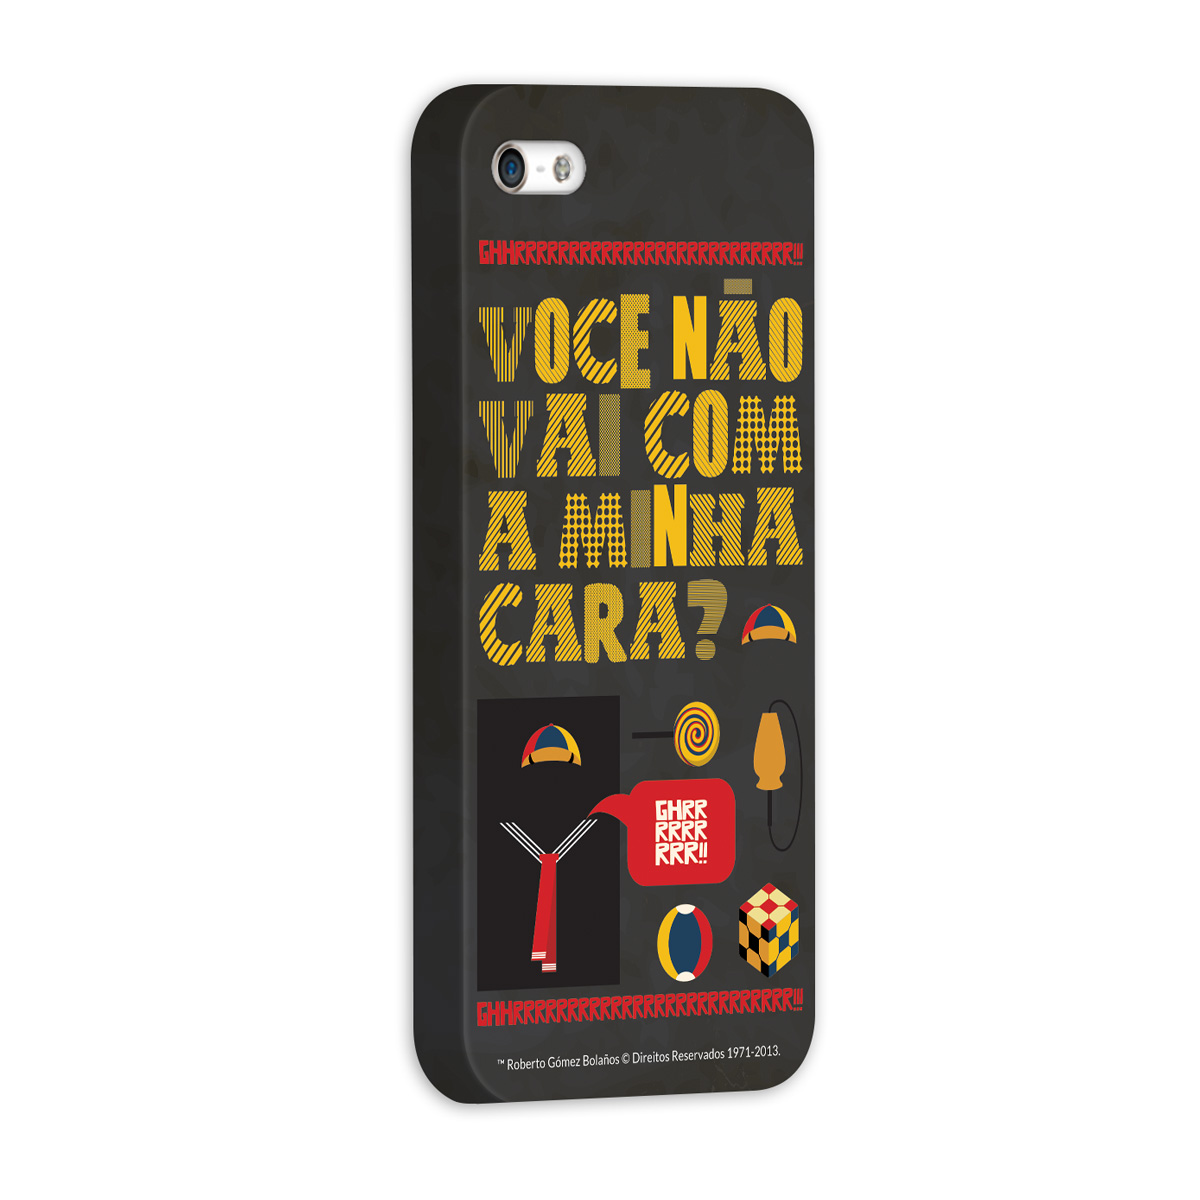 Capa de iPhone 5/5S Chaves Ícones Quico Vintage